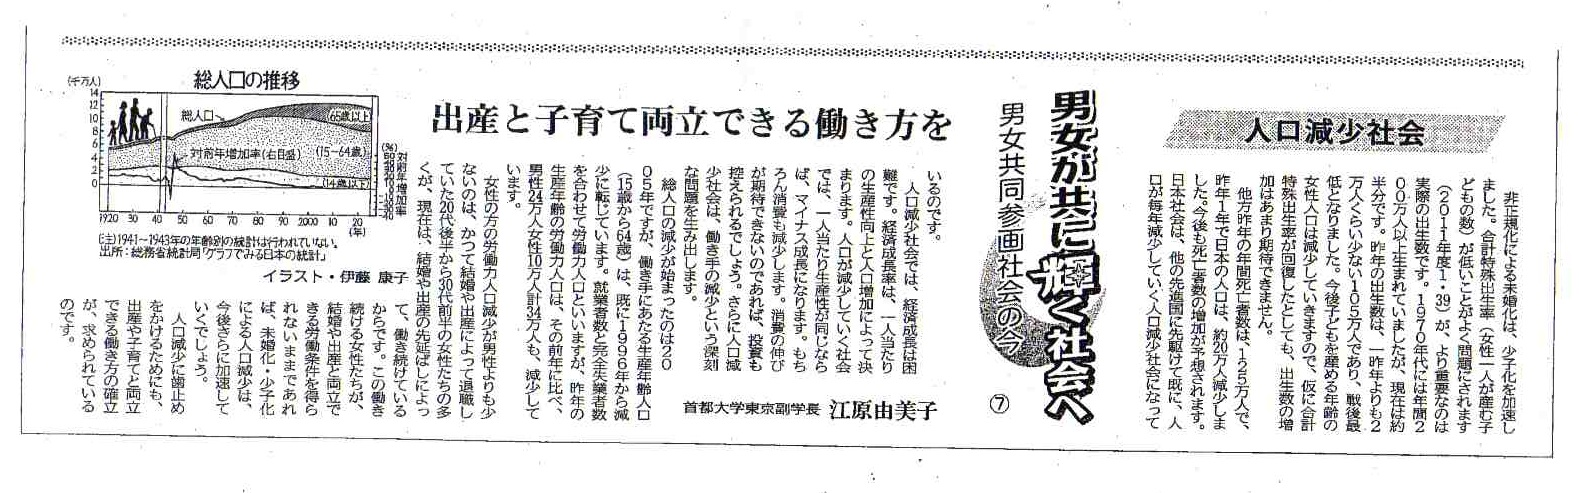 20121023komei_2